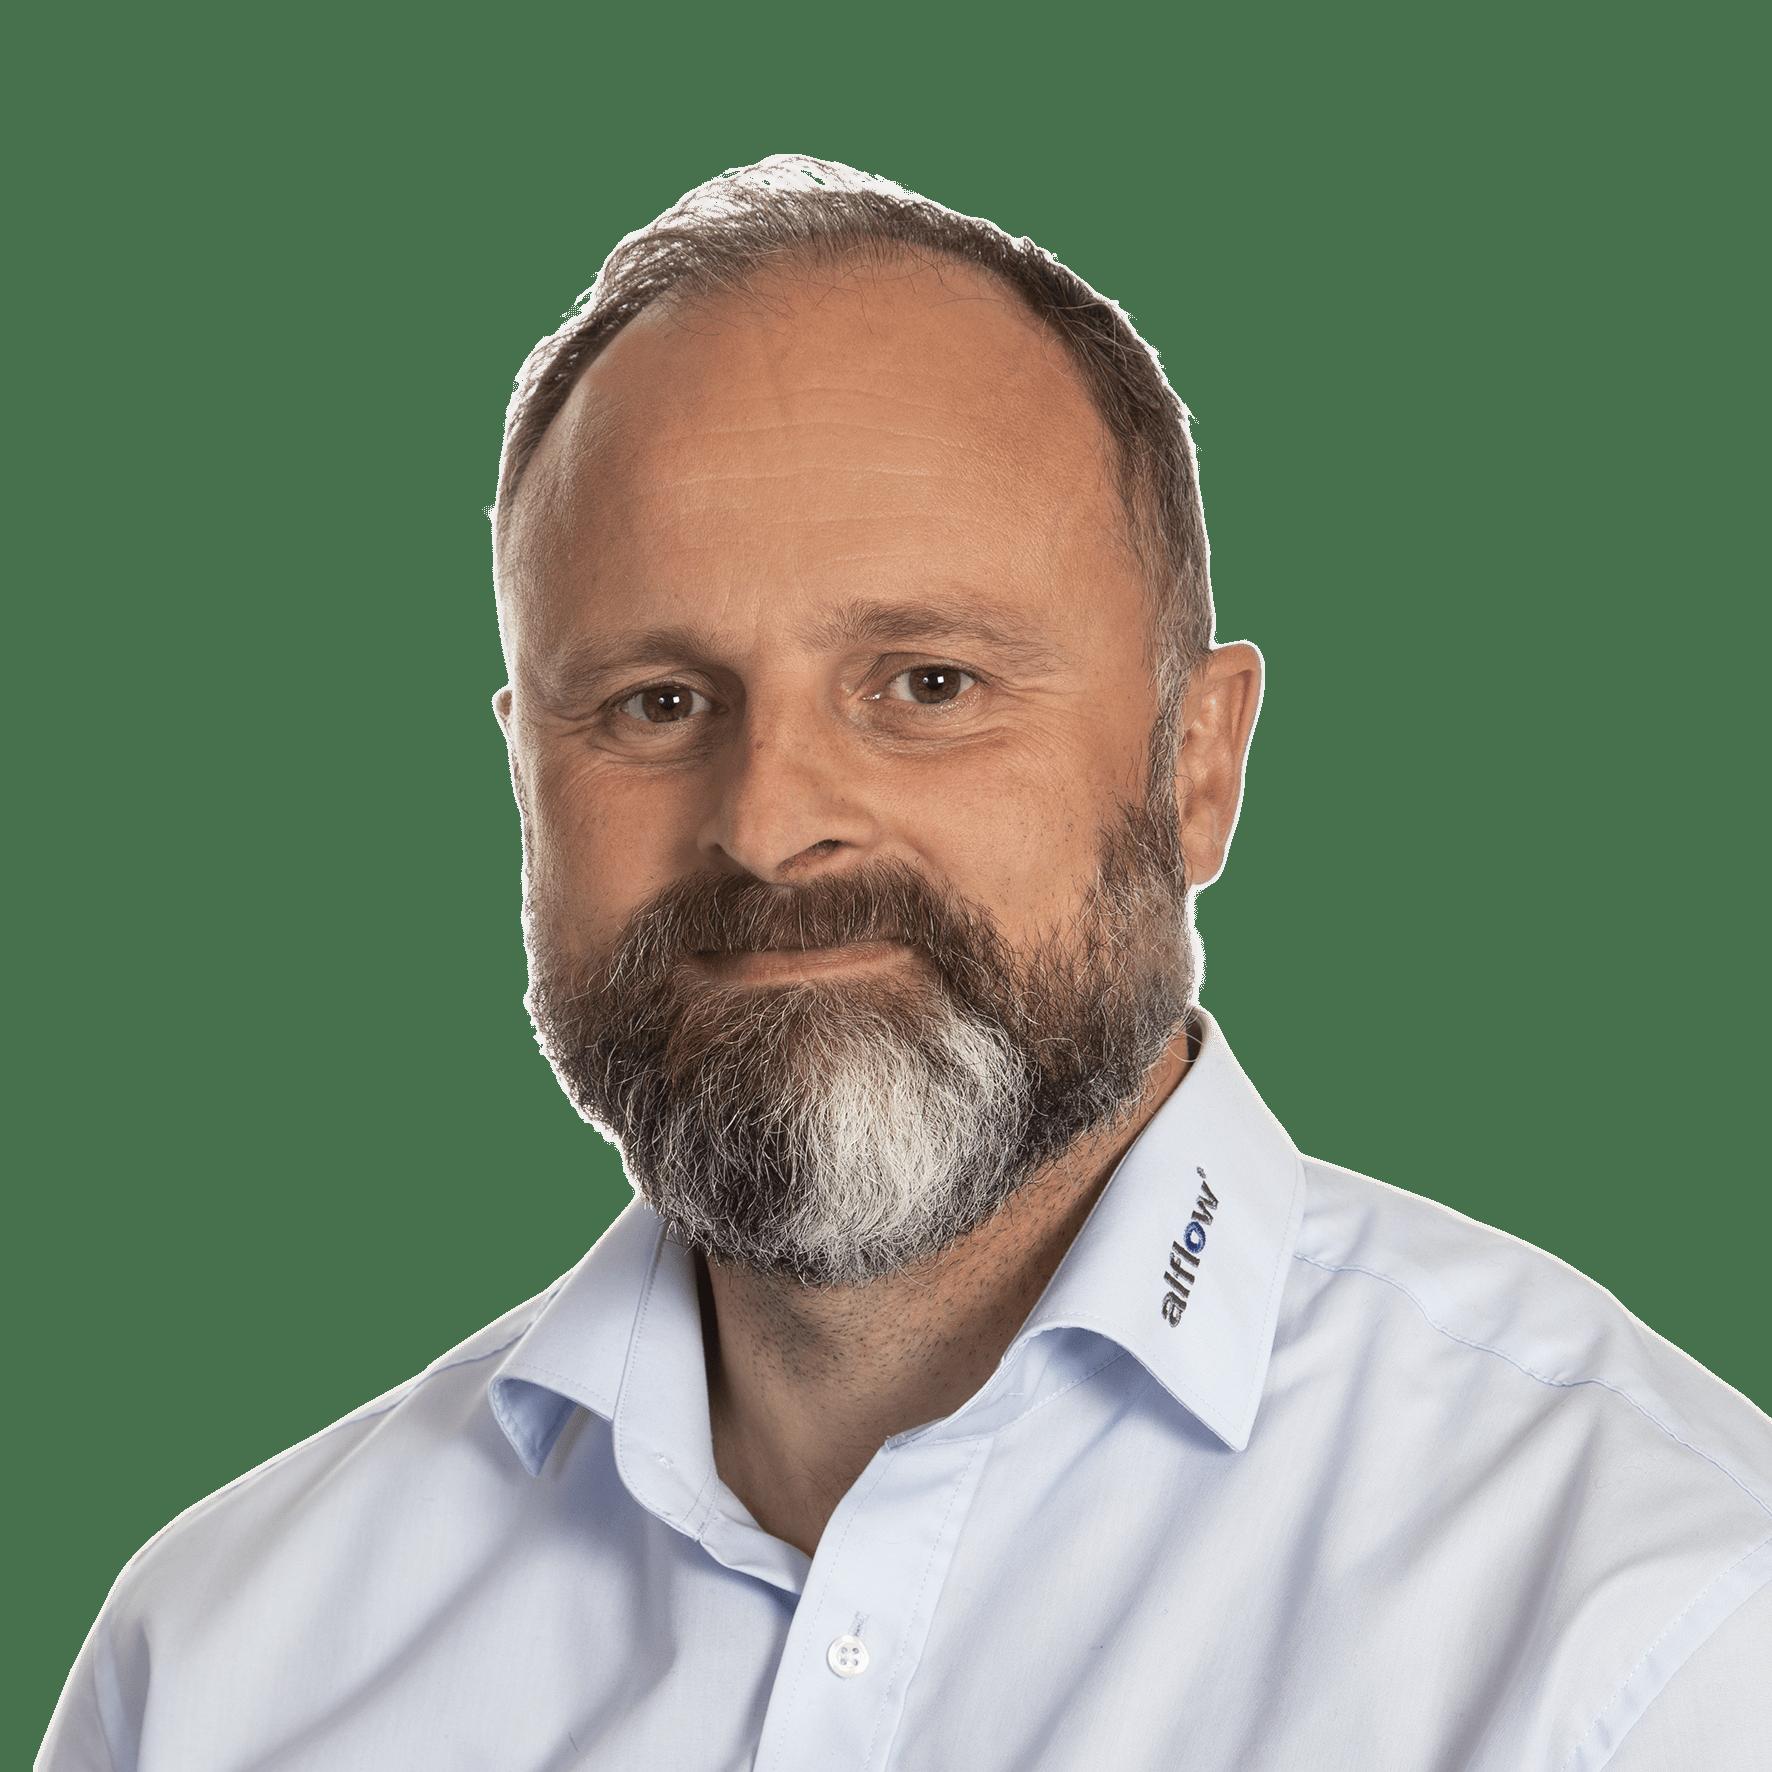 Morten Overbeck Kaasen